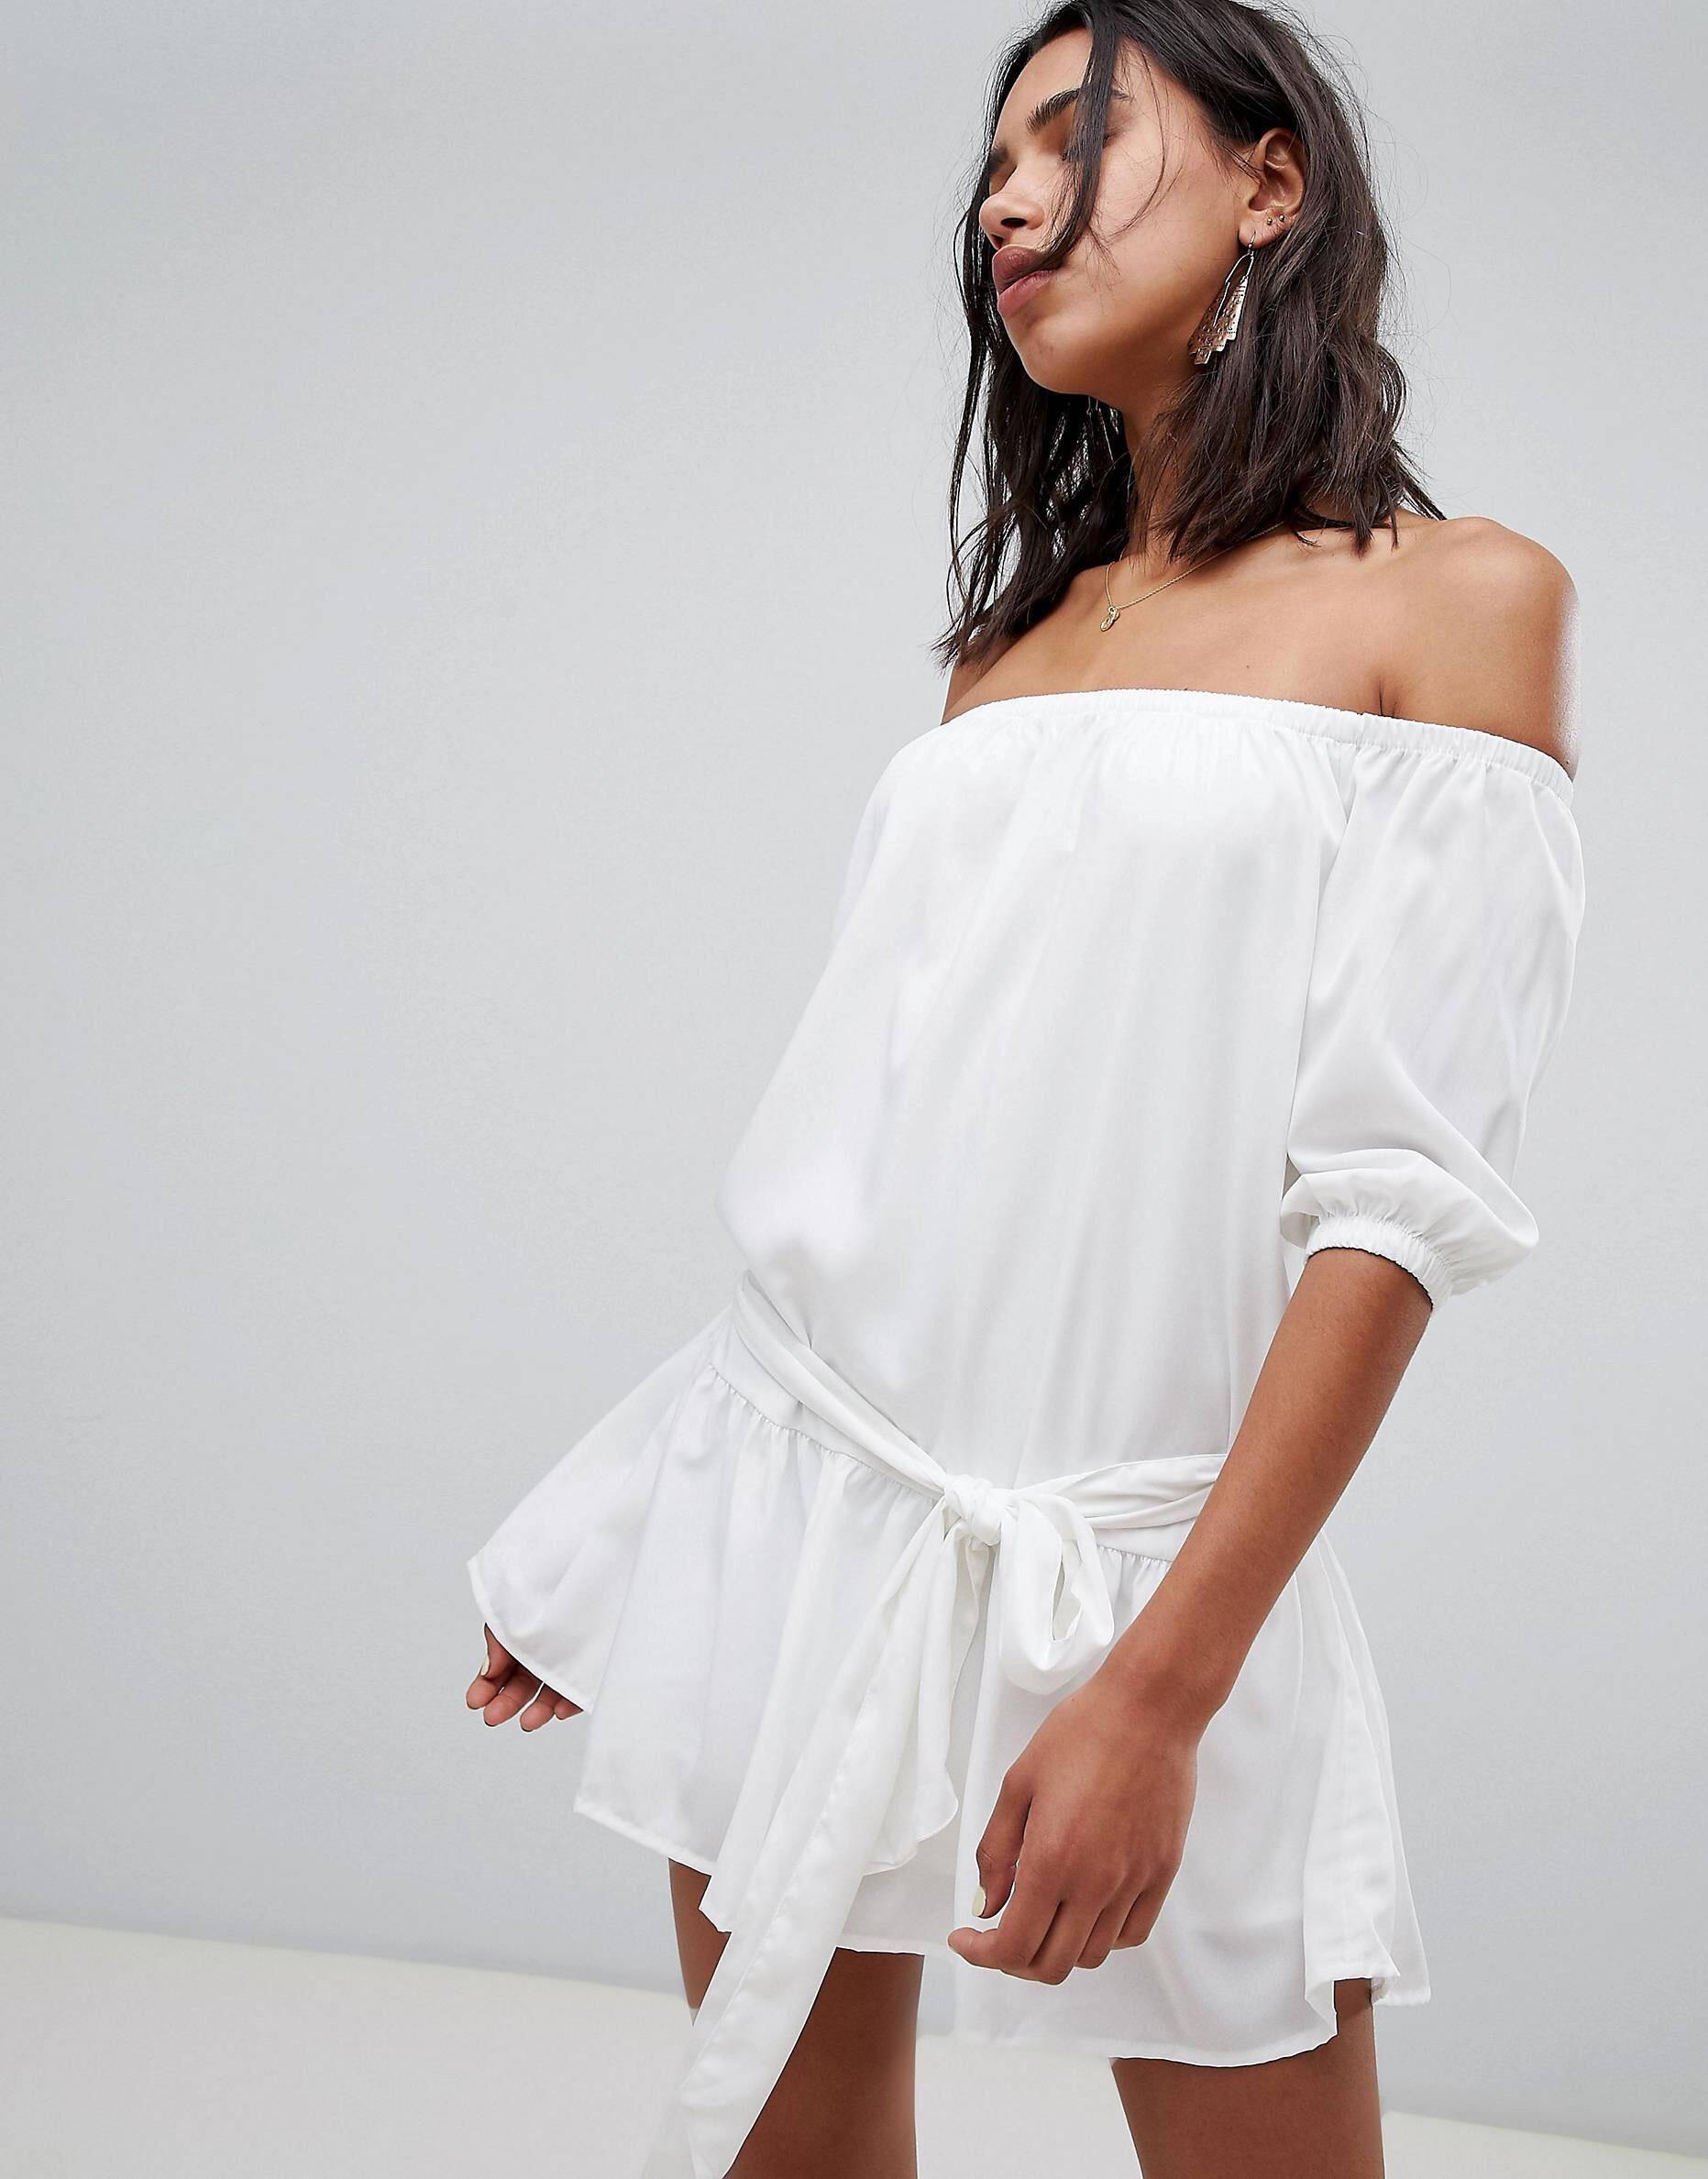 Off the shoulder dress, Vero Moda, $39.  Find it  here .